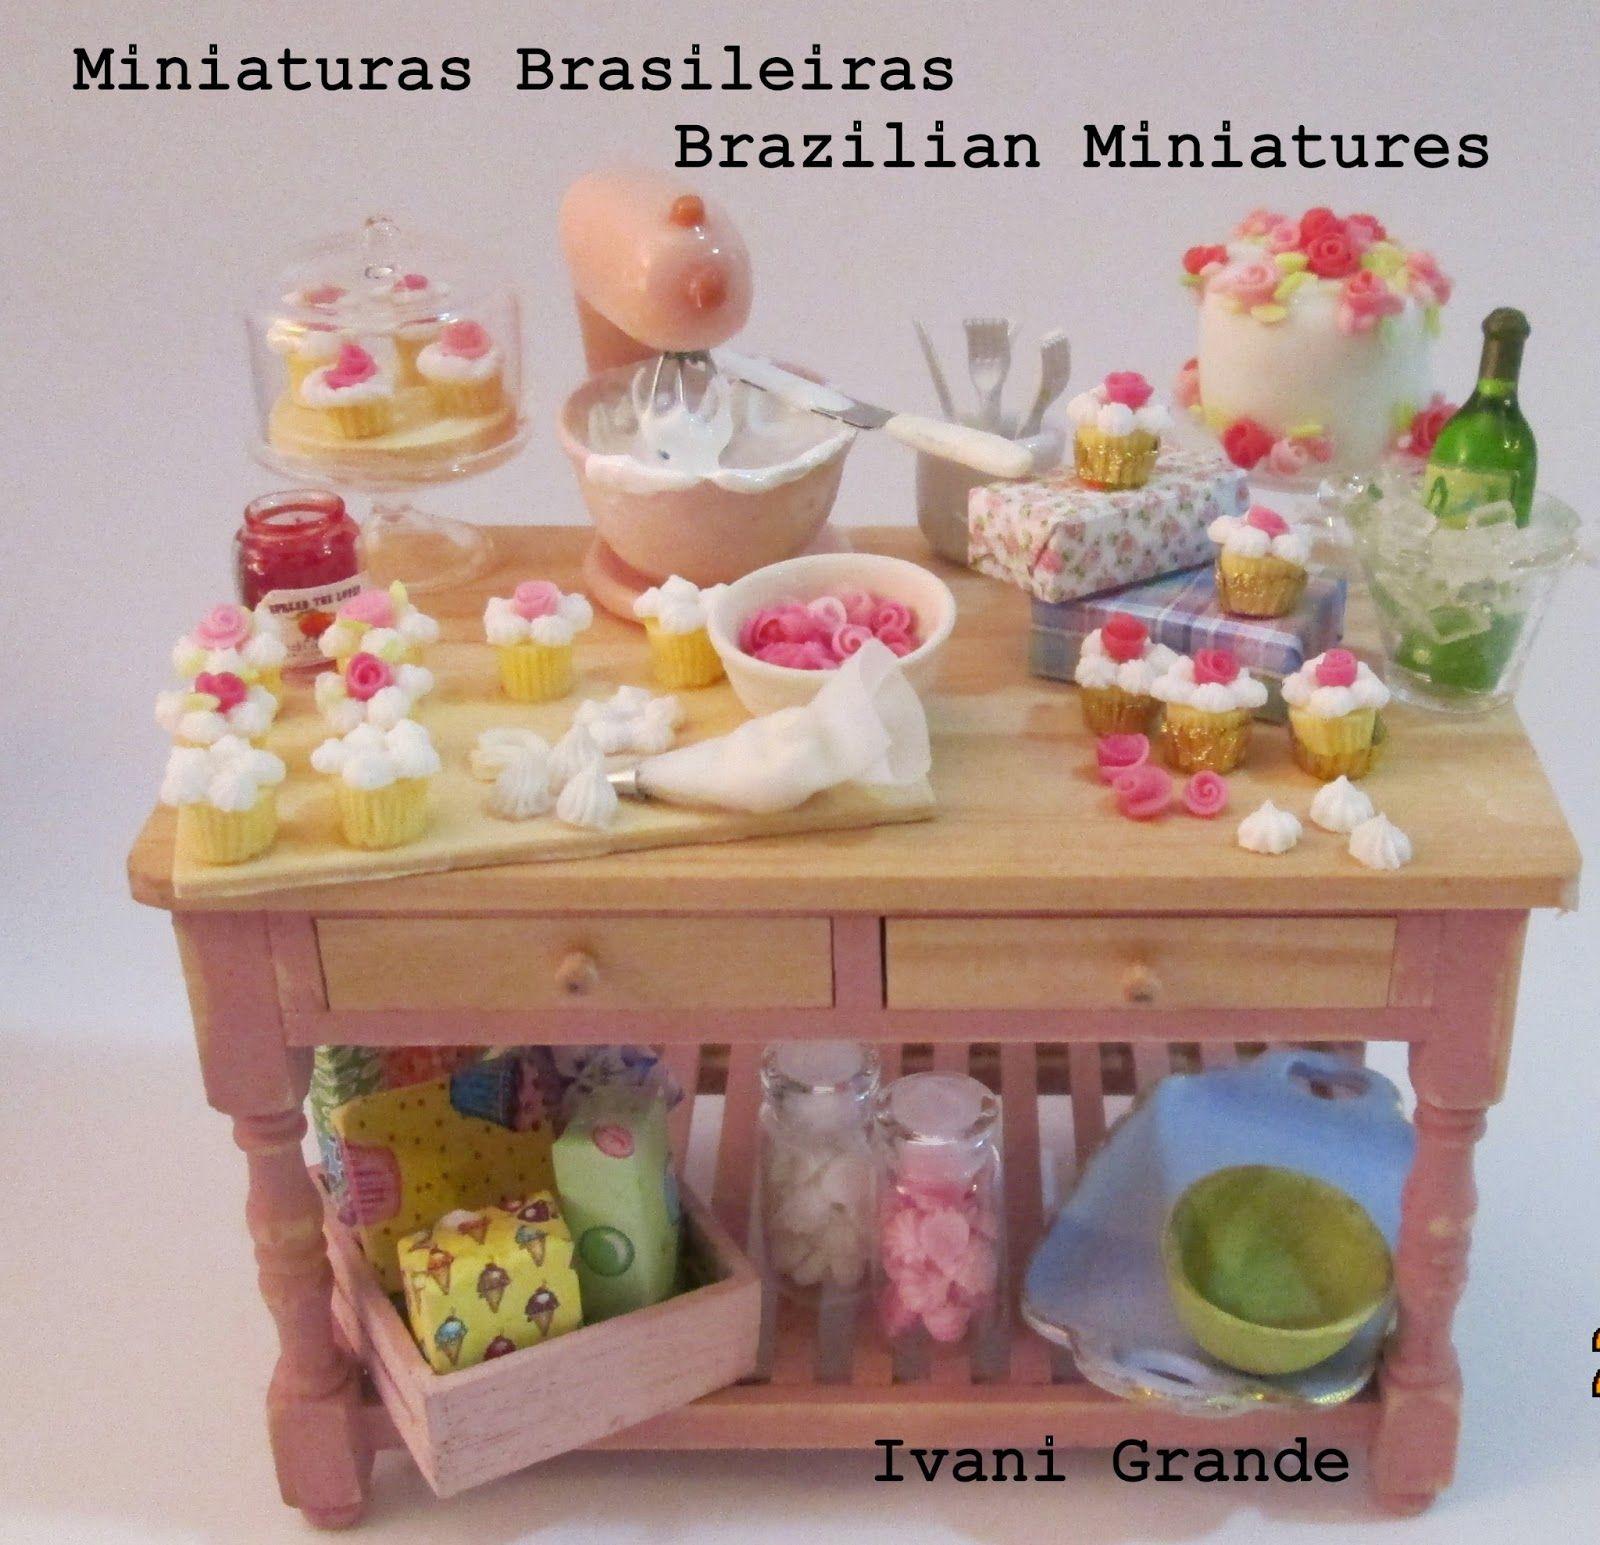 https://www.etsy.com/pt/shop/MiniaturaBrasileira  Ivani Grande